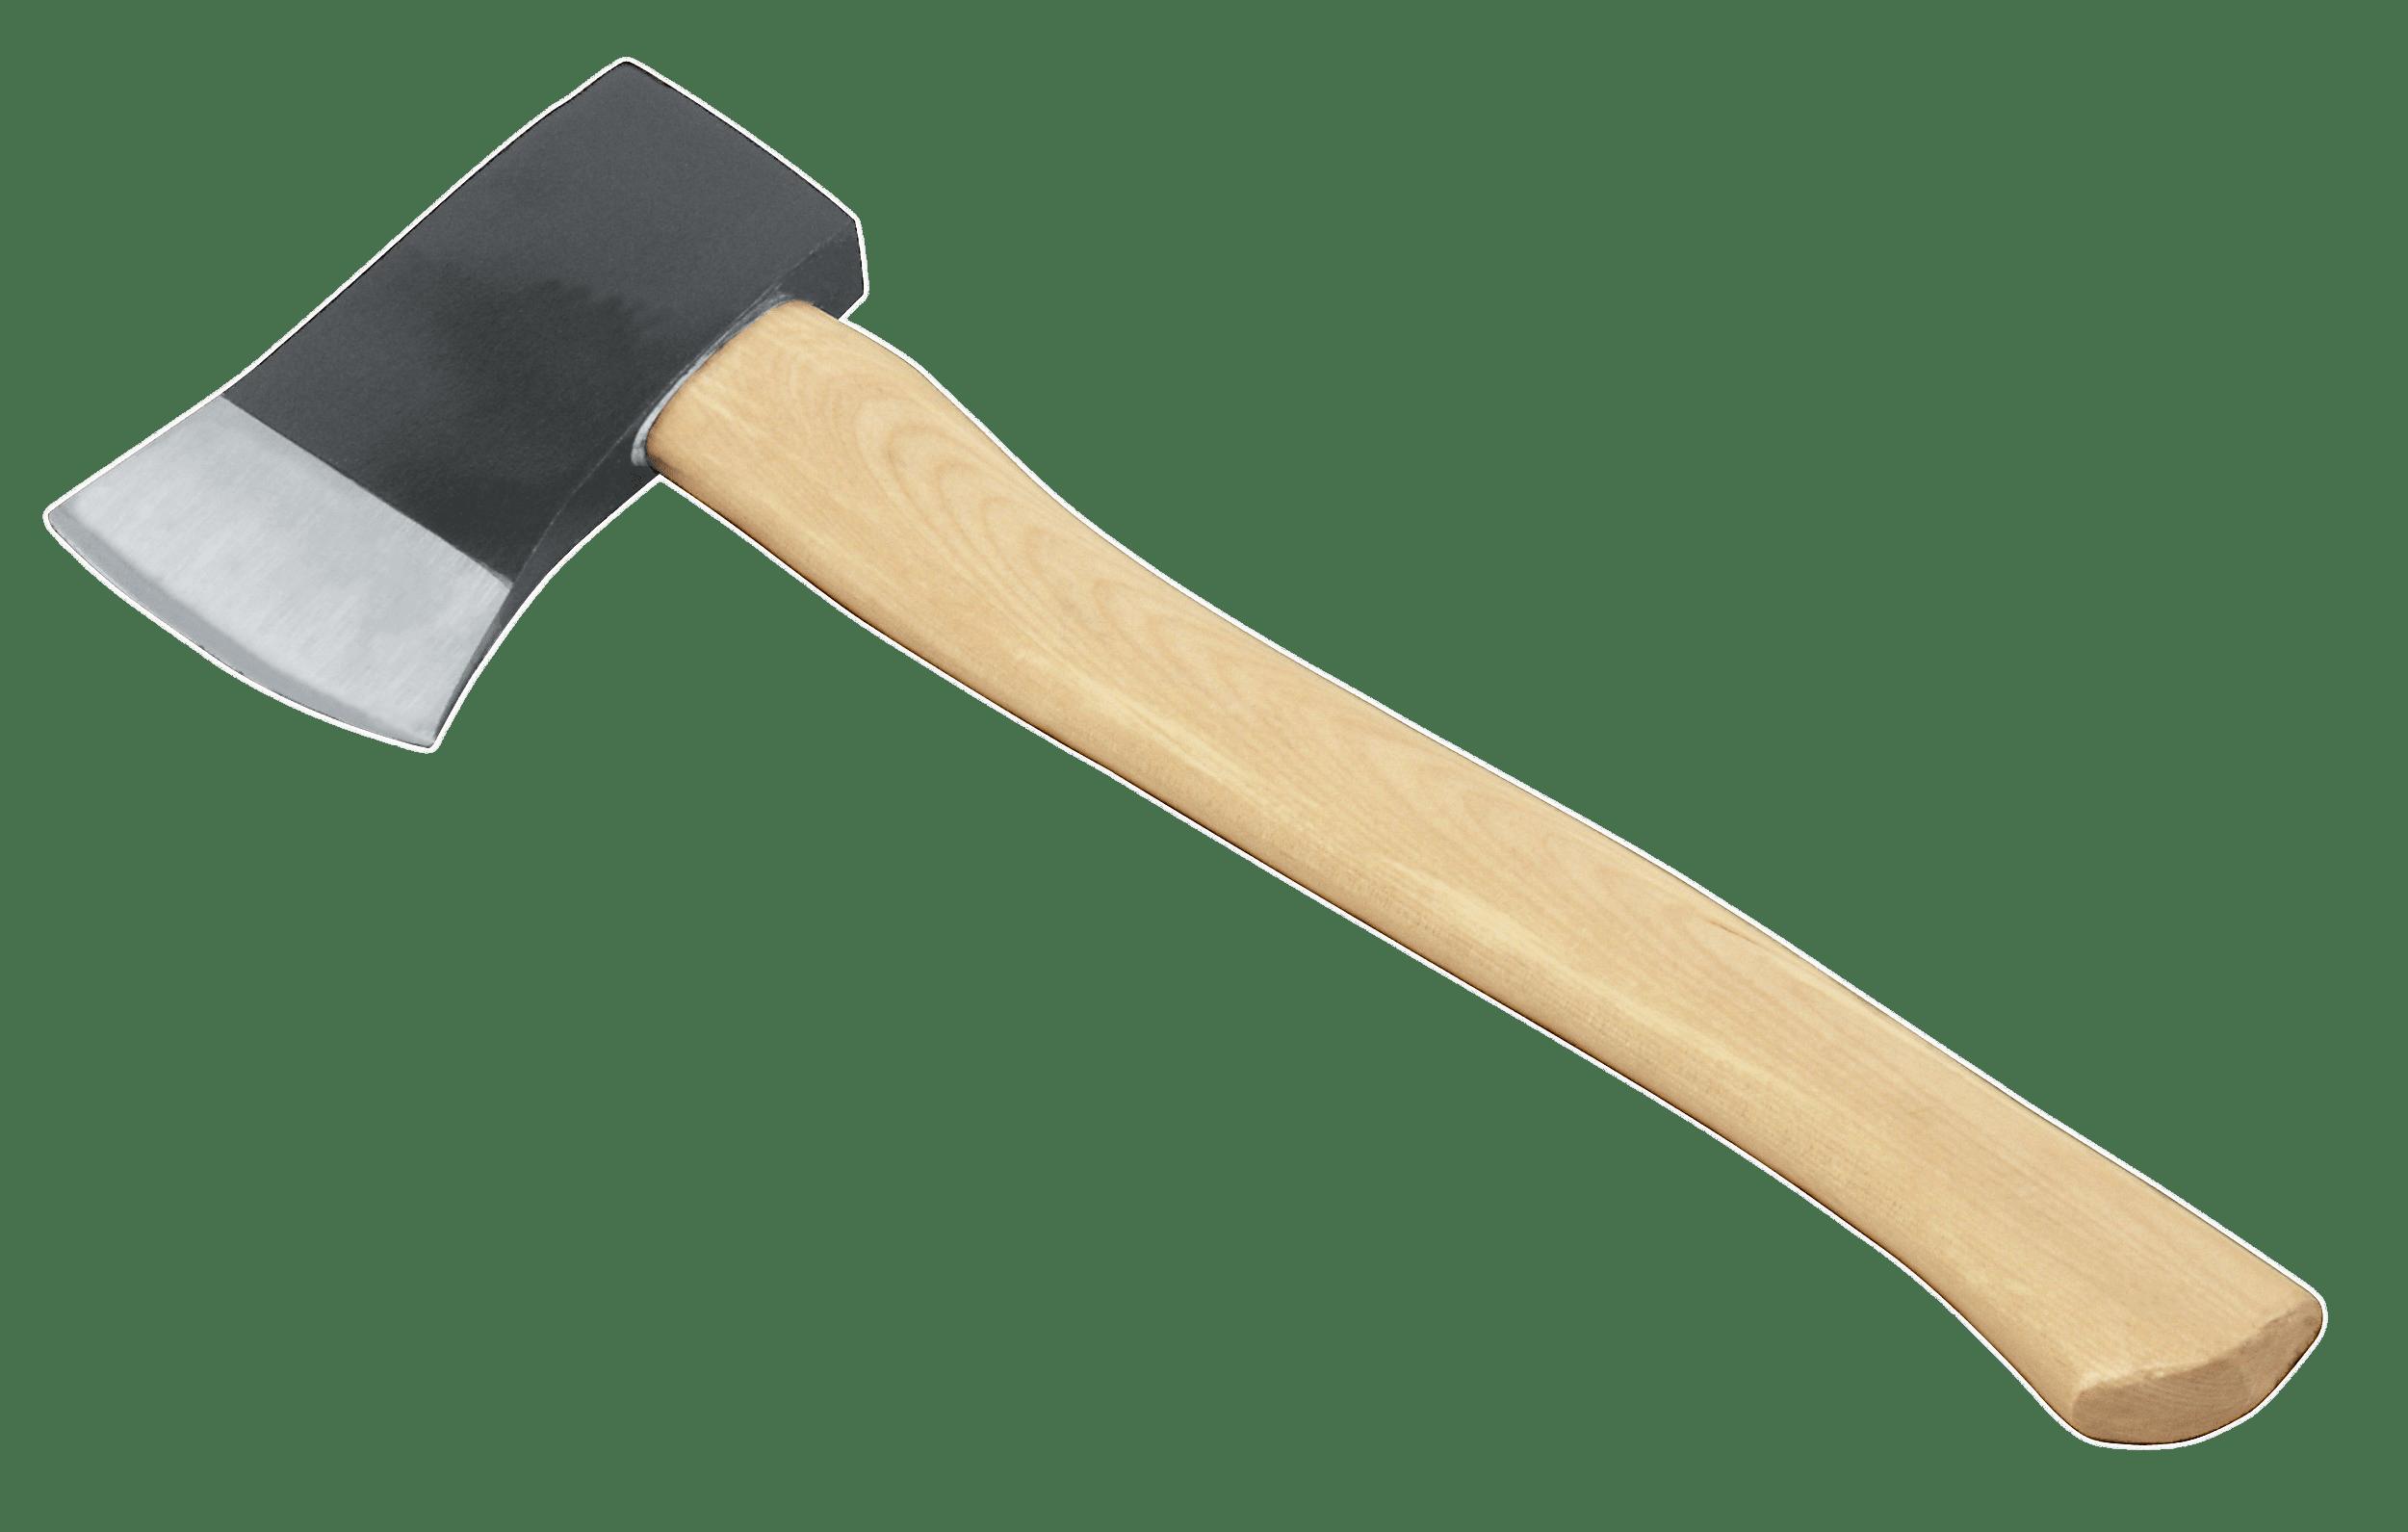 Clipart hammer vintage. Axe transparent png stickpng